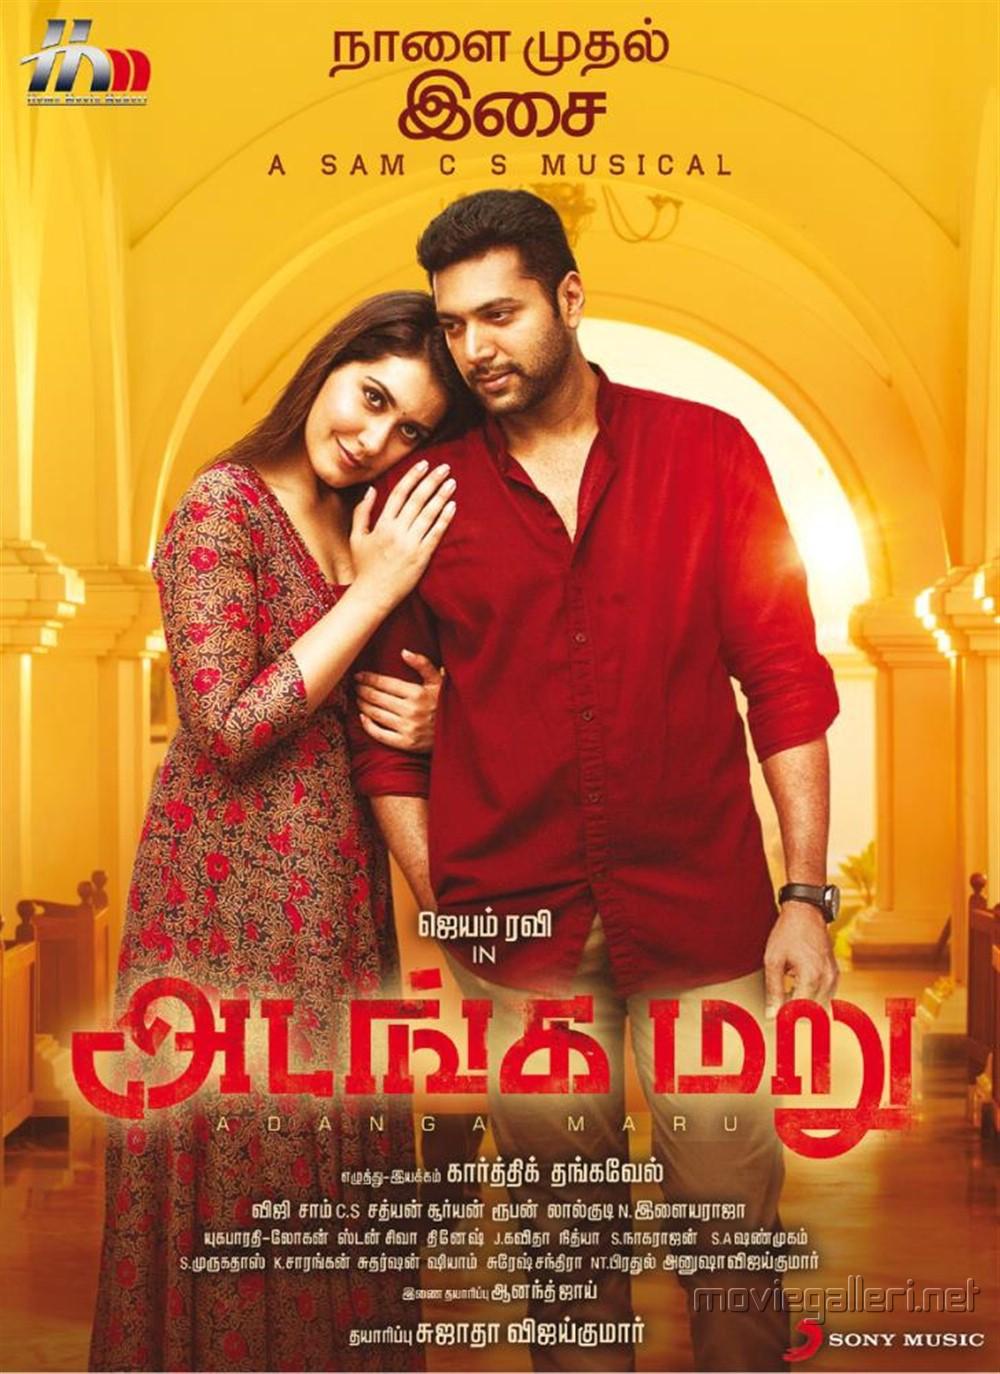 Raashi Khanna Jayam Ravi Adanga Maru Movie Audio Release Posters